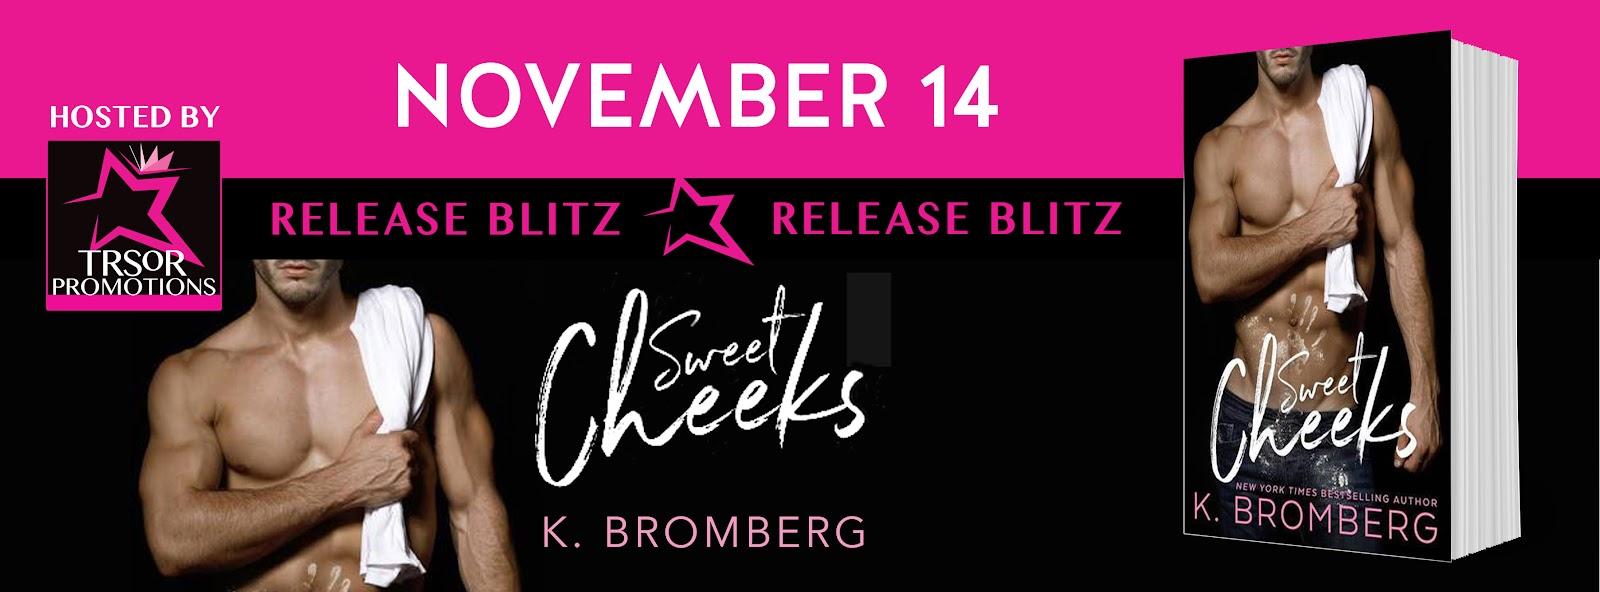 SWEET_CHEEKS_RELEASE_BLITZ.jpg